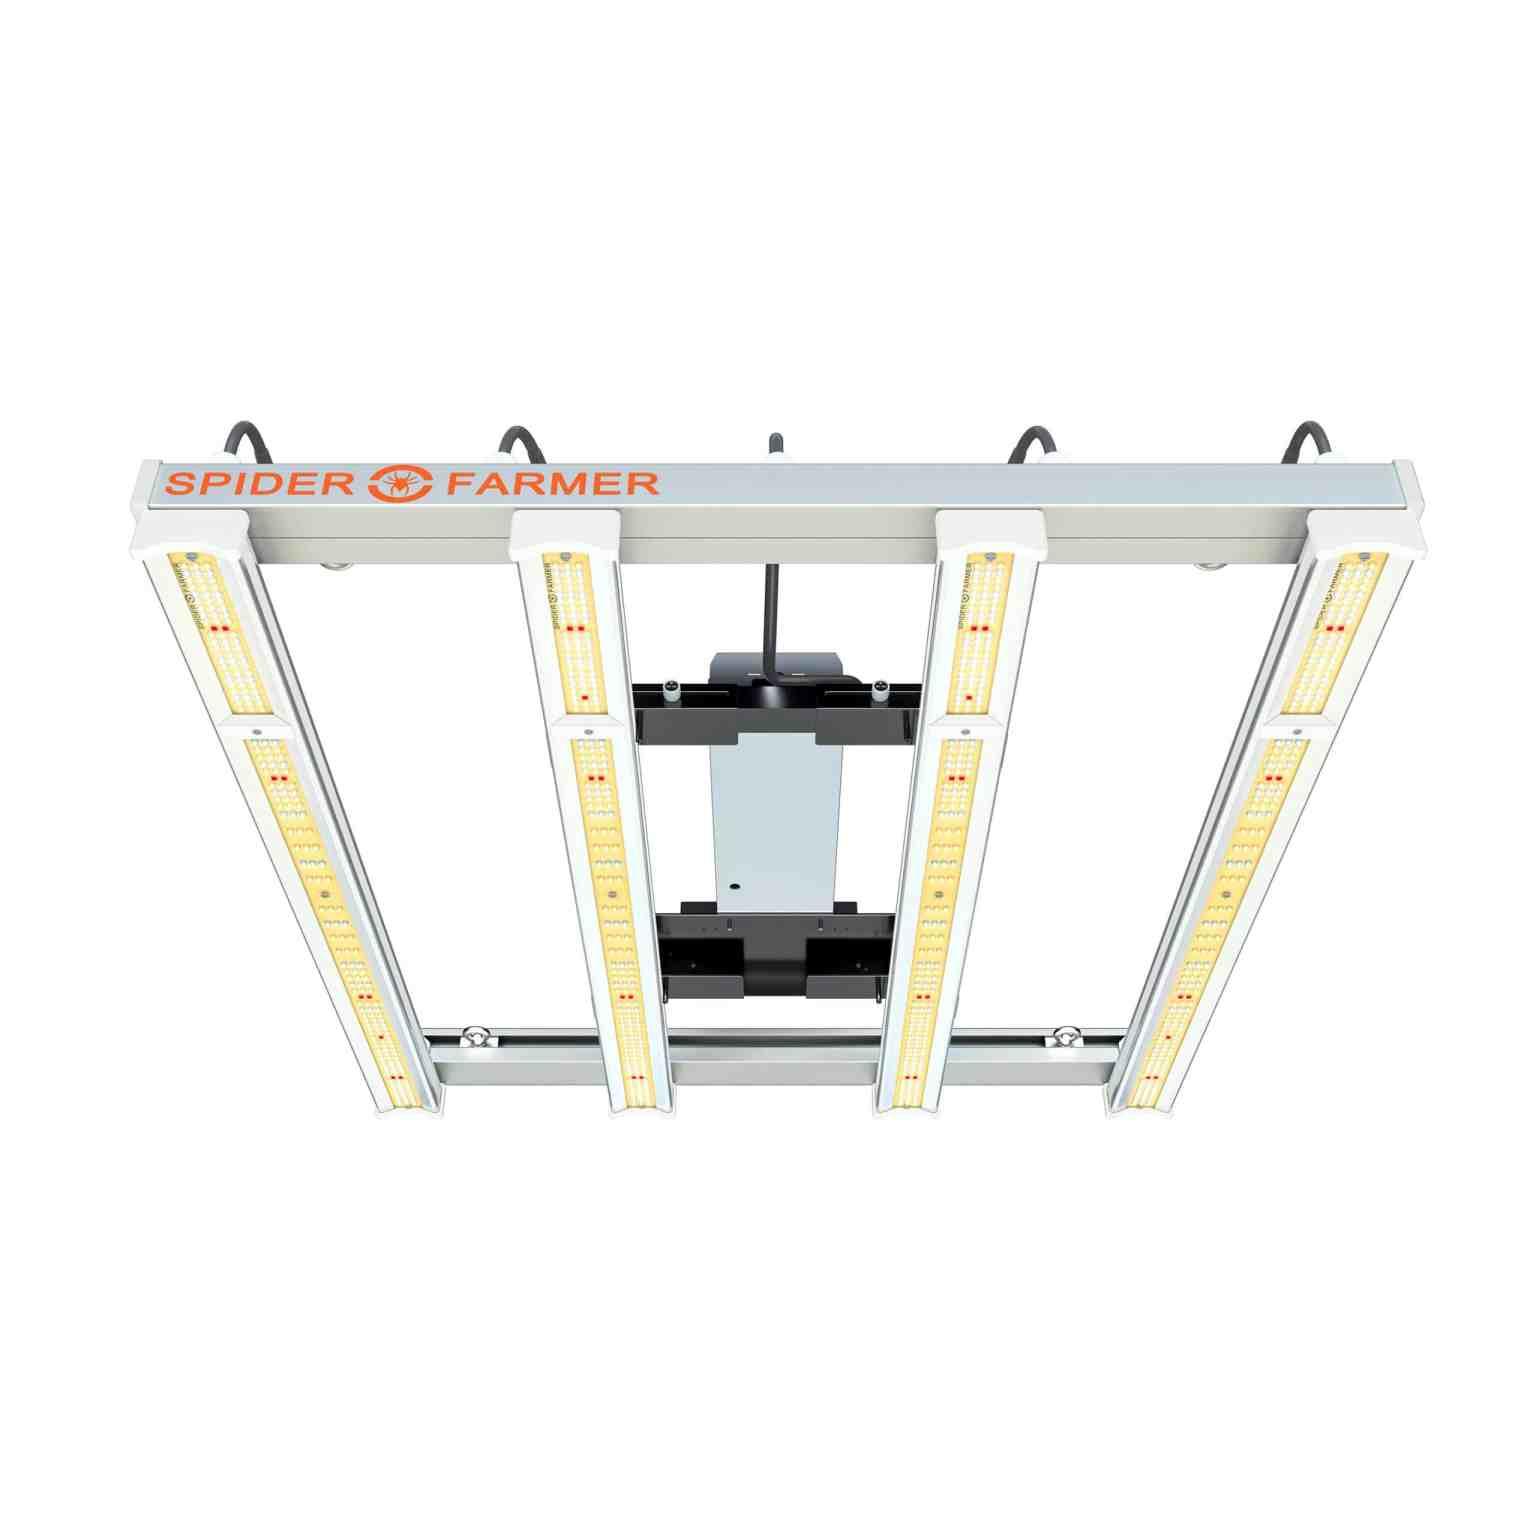 SE3000 led grow light